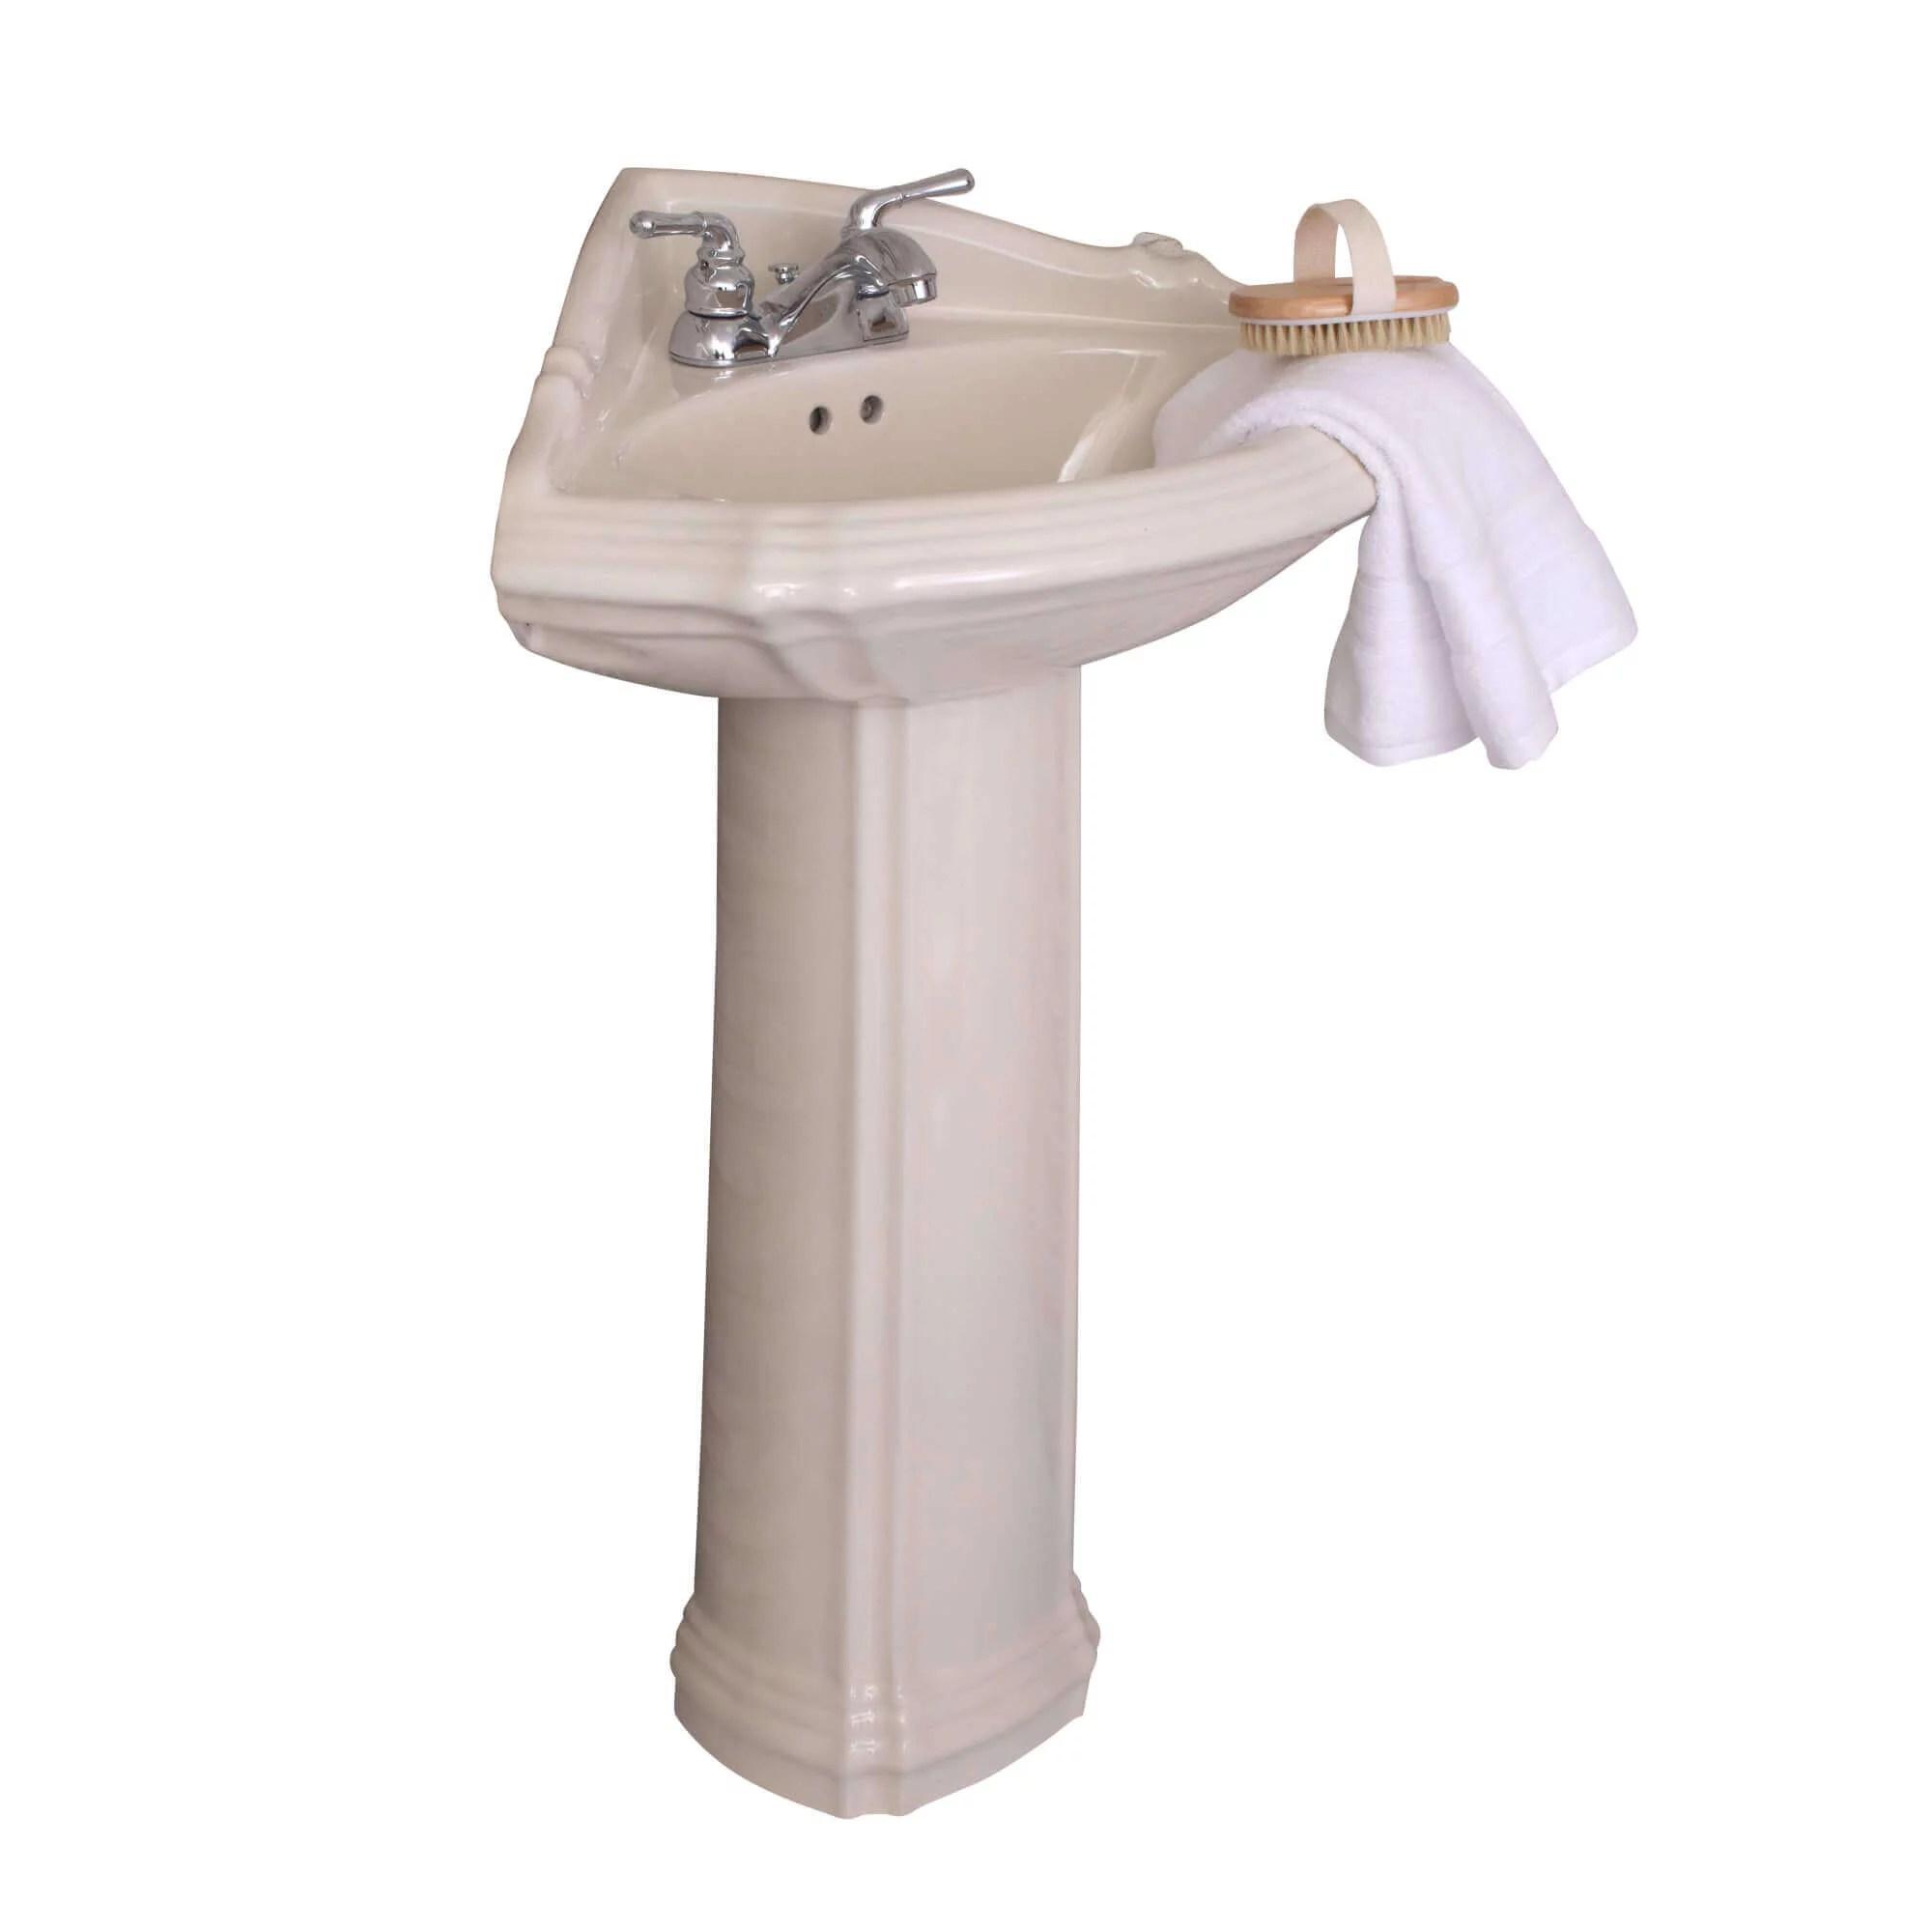 fine fixtures regent corner pedestal sink biscuit color vitreous china ceramic material 4 inch faucet spread hole walmart com